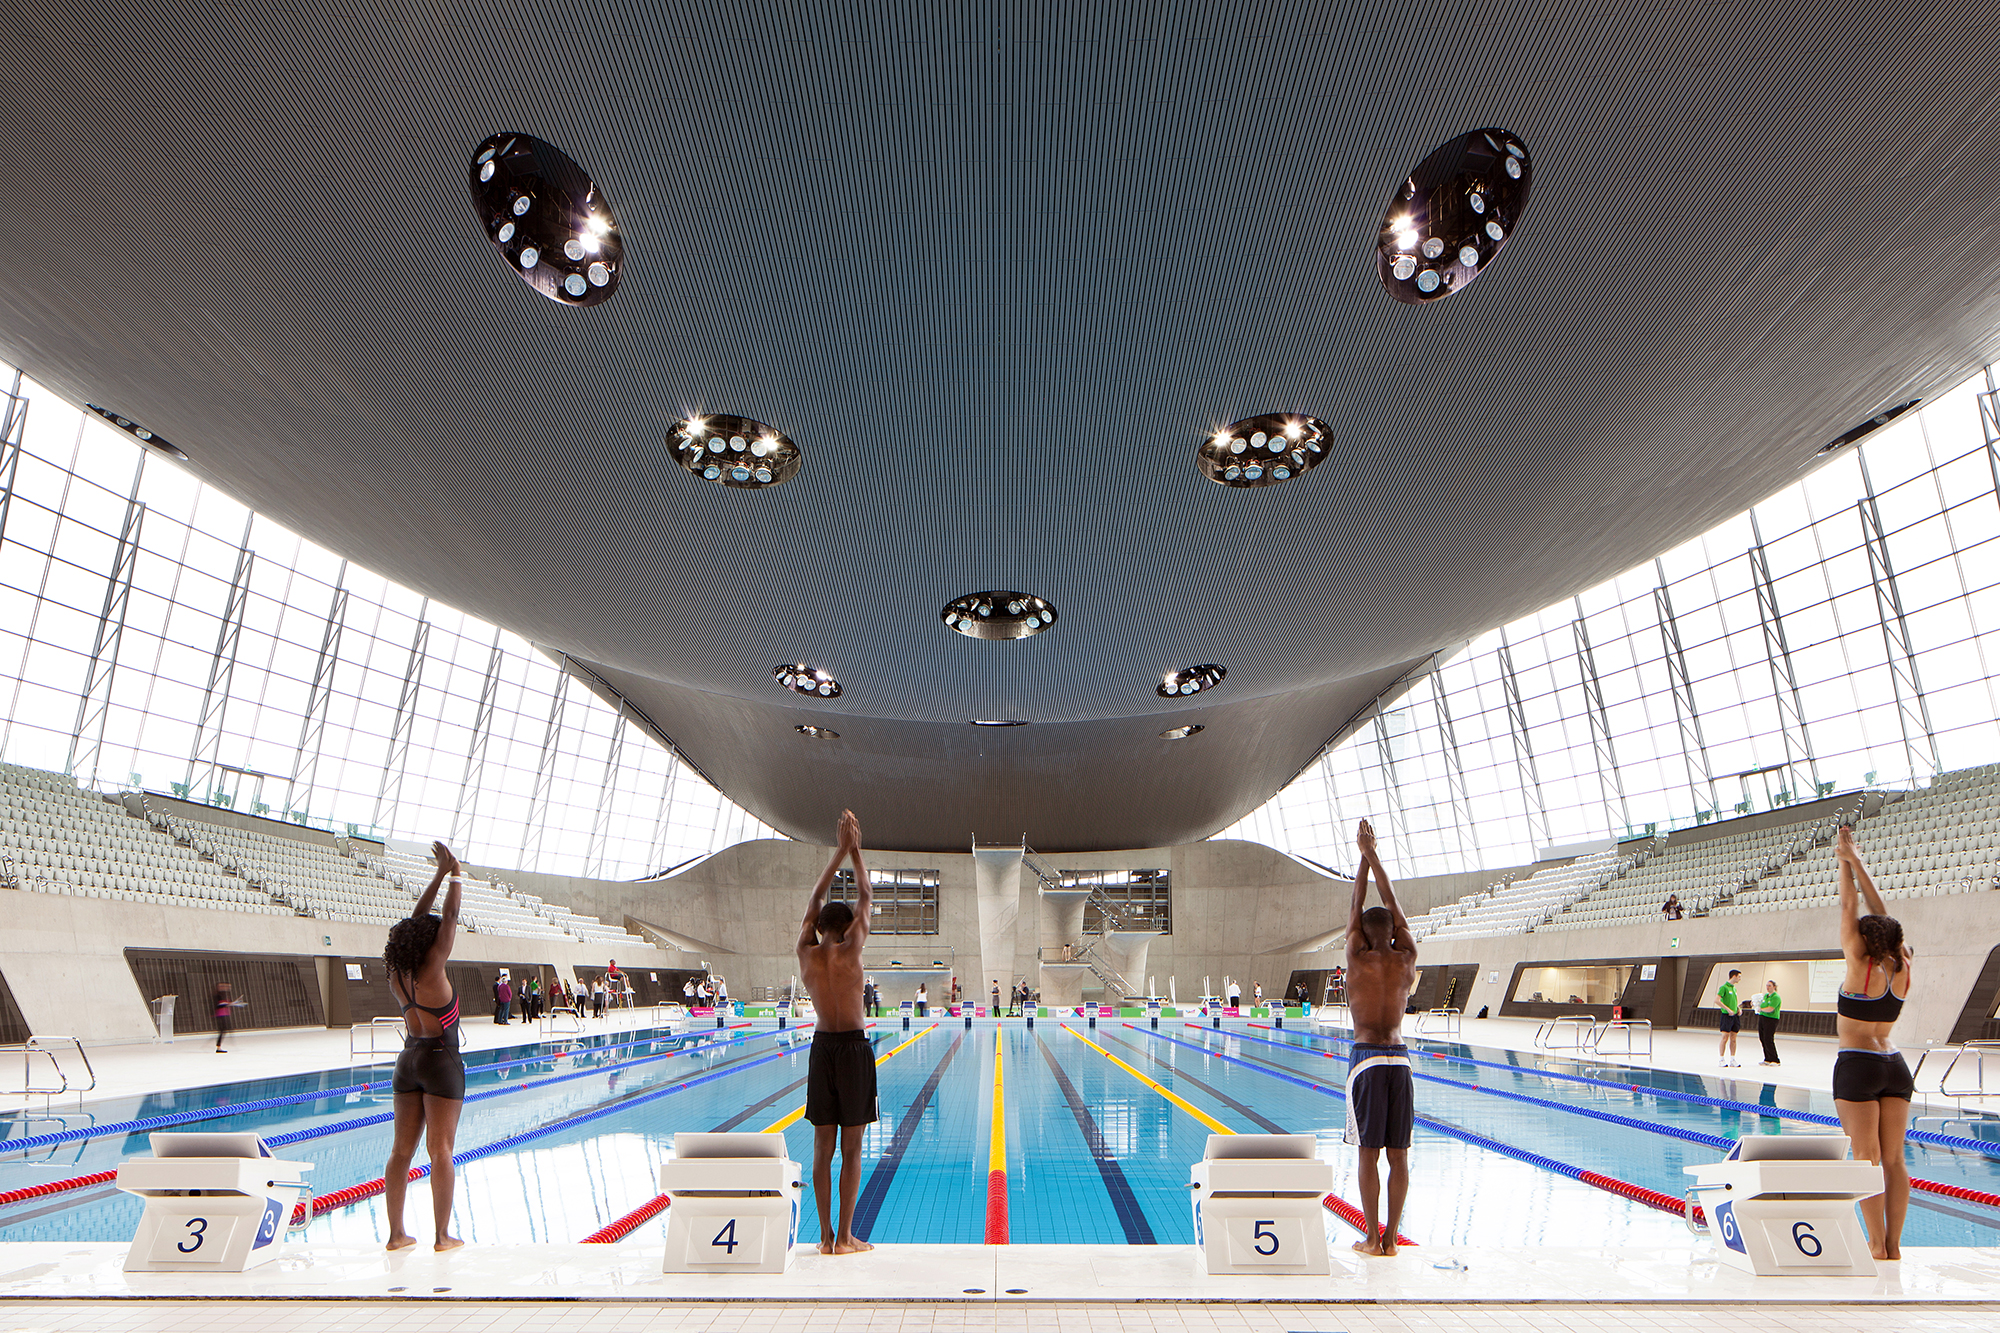 London Aquatics Centre in London.